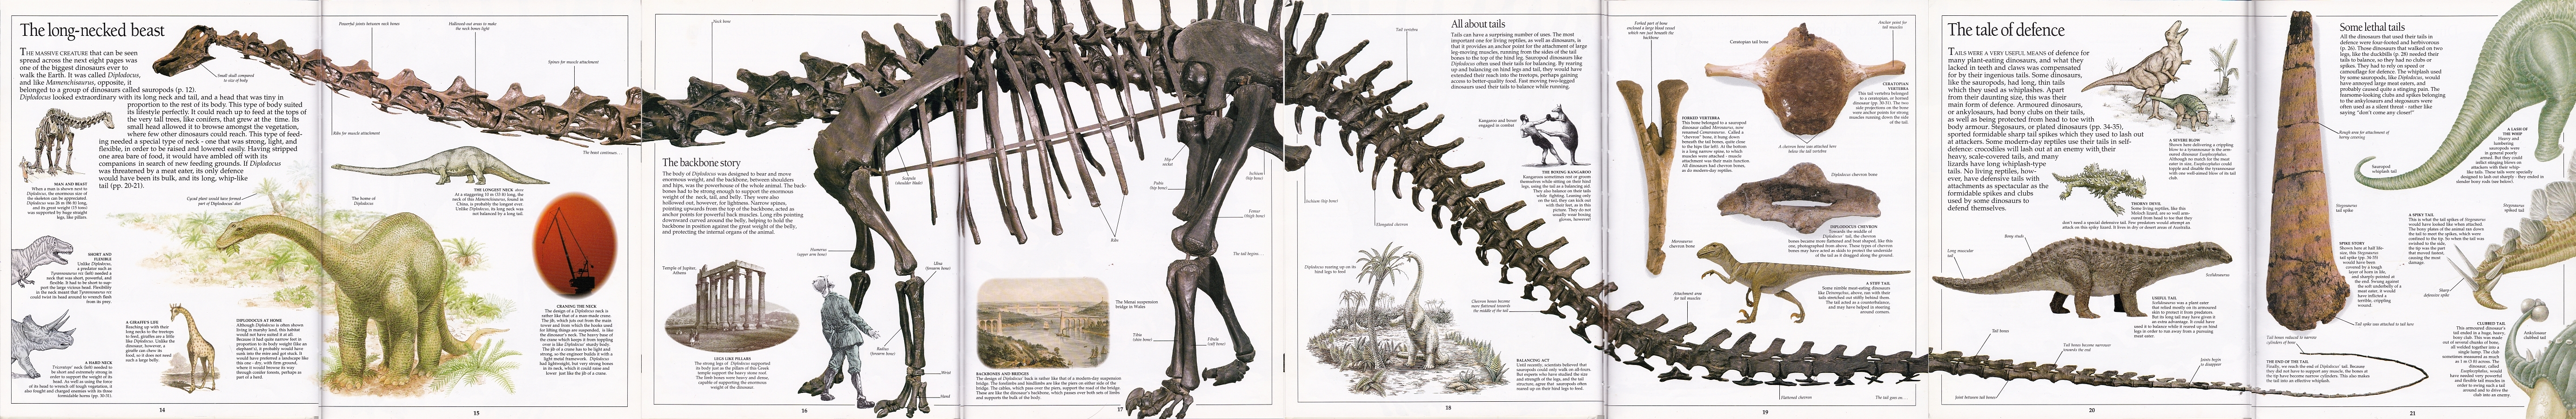 Eyewitness Diplodocus composite